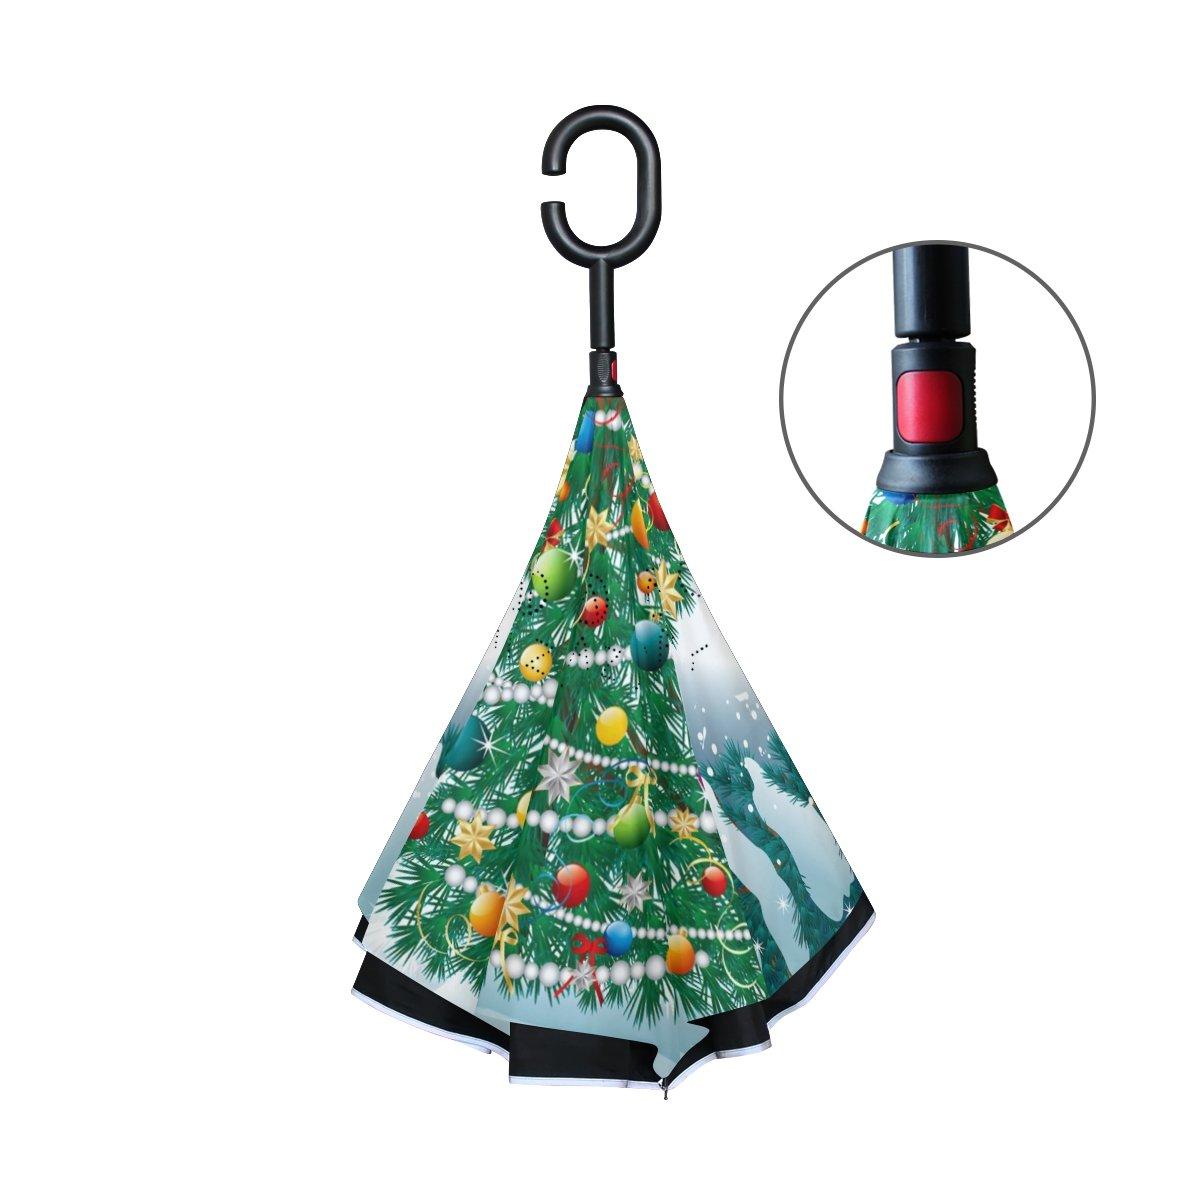 Amazon.com : imobaby Christmas Tree Inverted Umbrella with Reverse ...